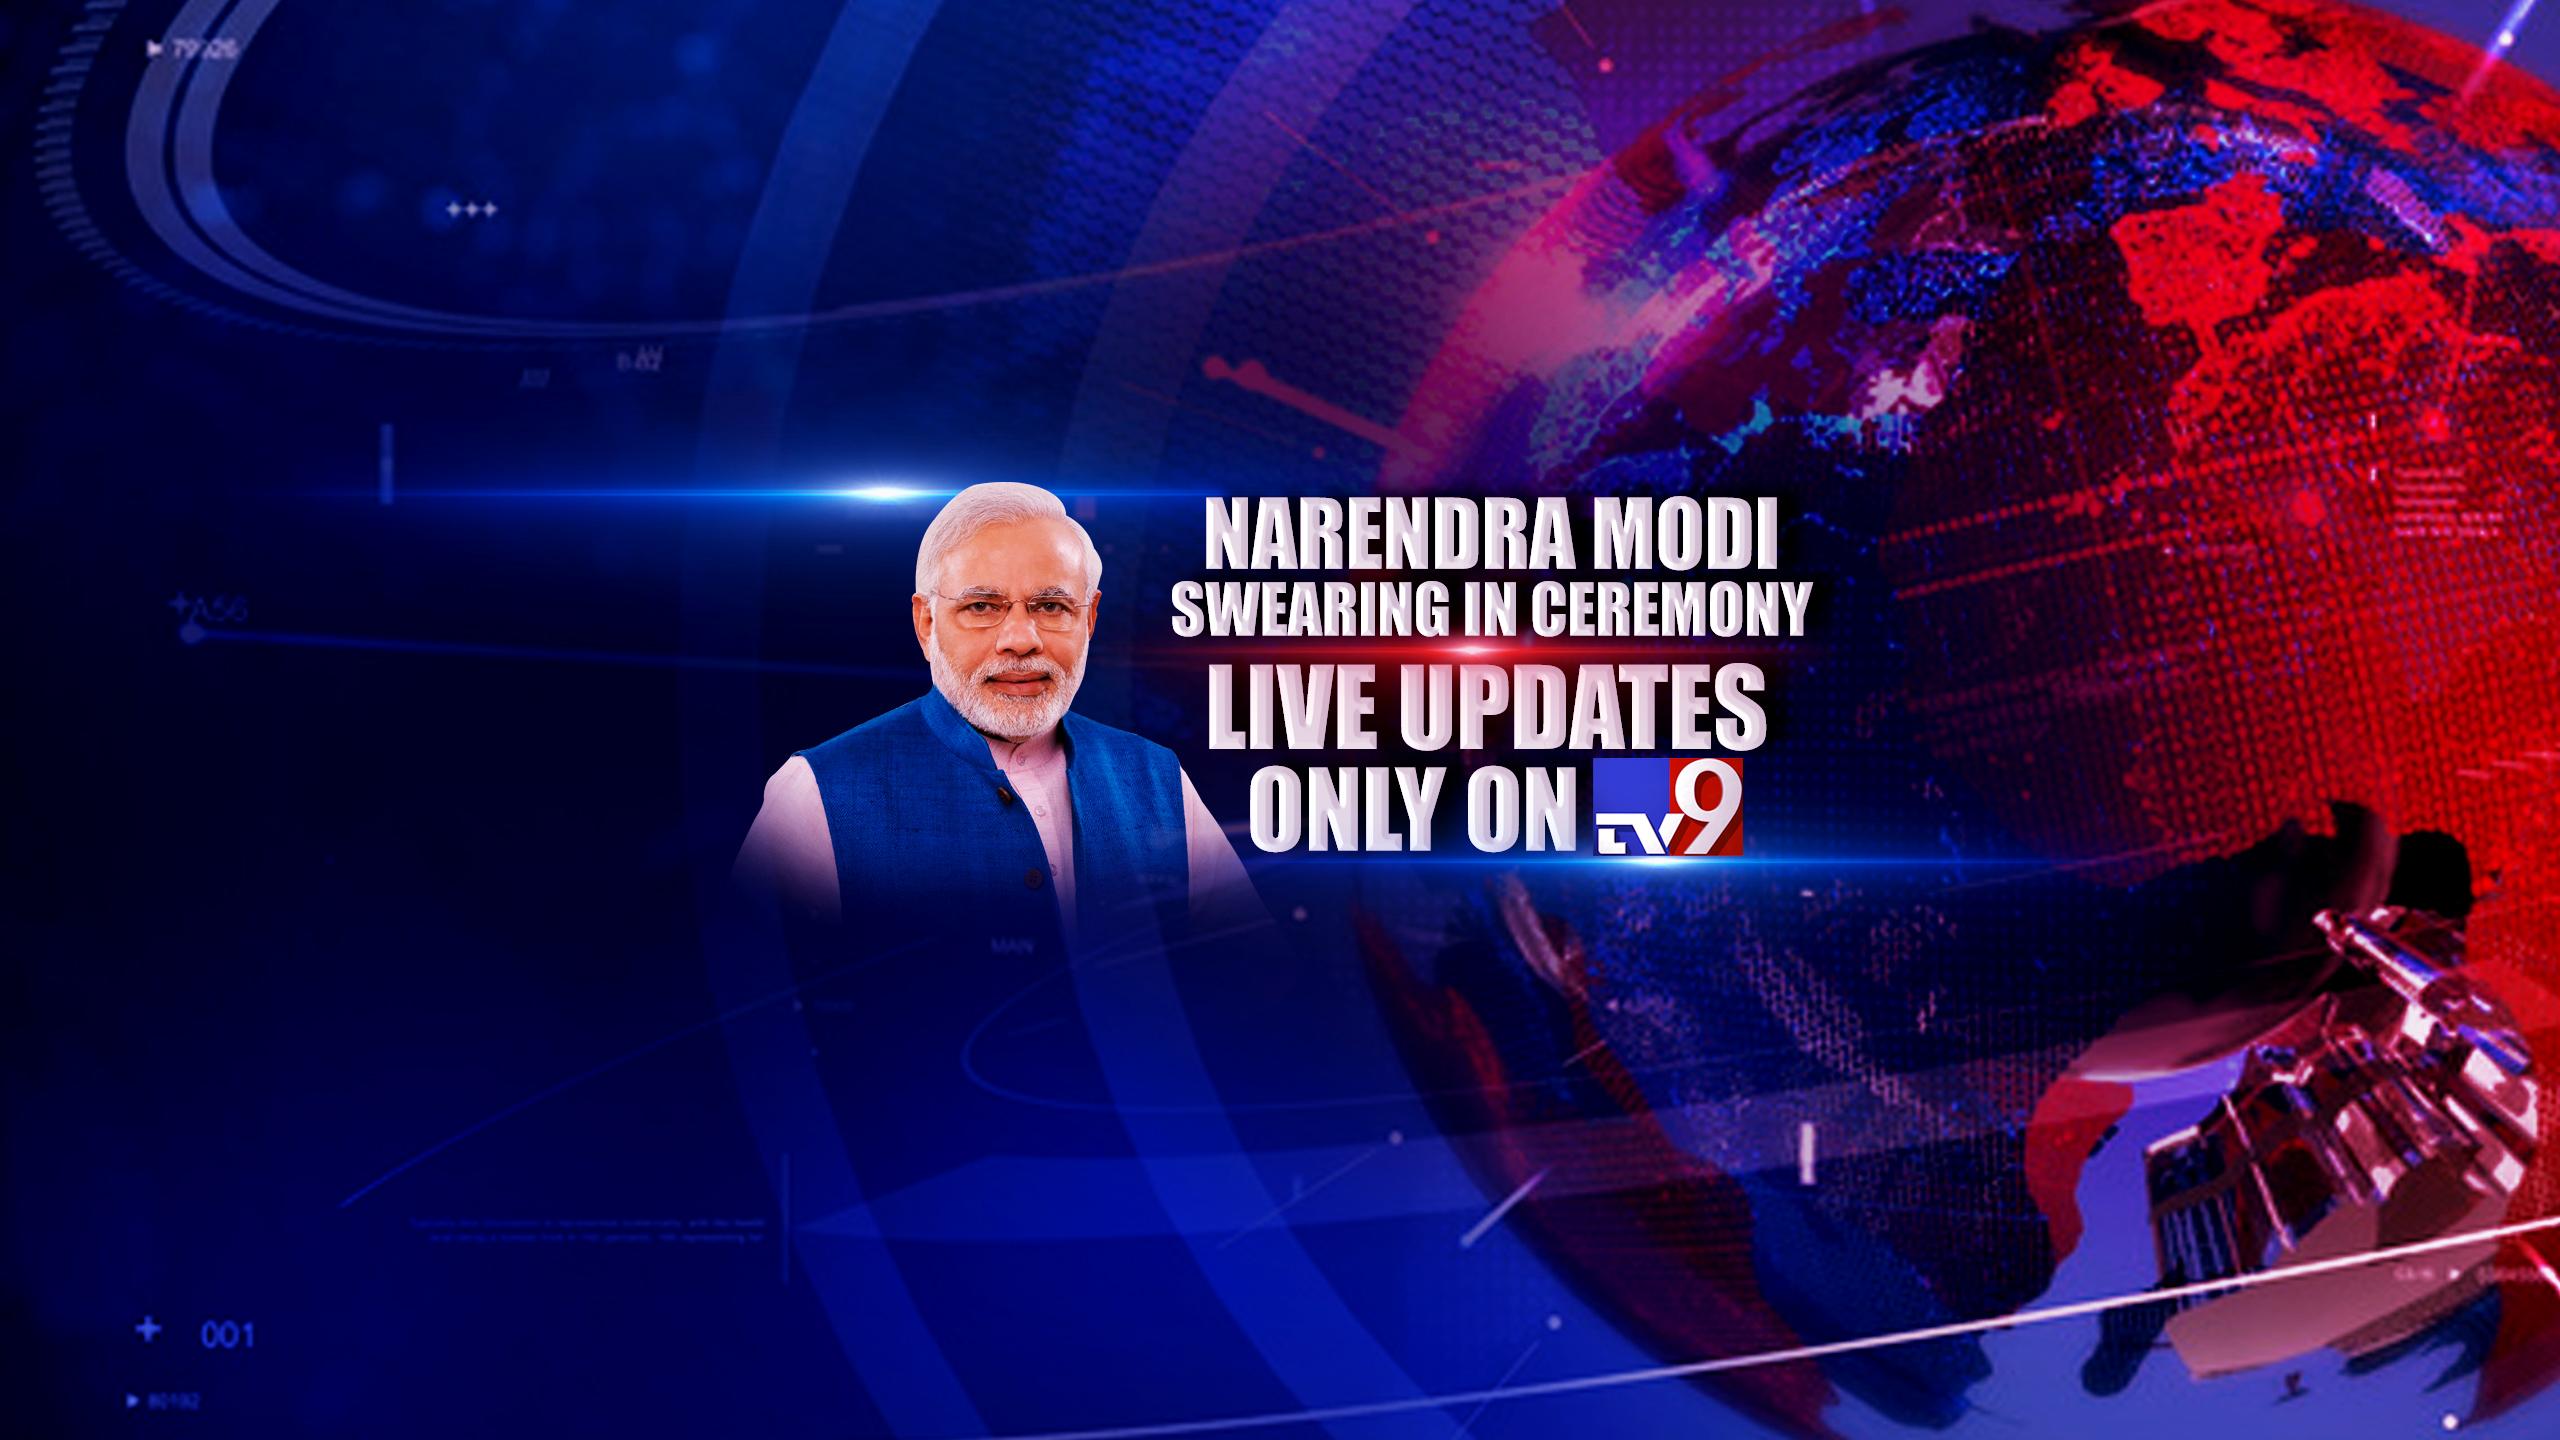 Narendra Modi, లైవ్ అప్డేట్స్ : ప్రధానమంత్రిగా మోదీ ప్రమాణ స్వీకారం